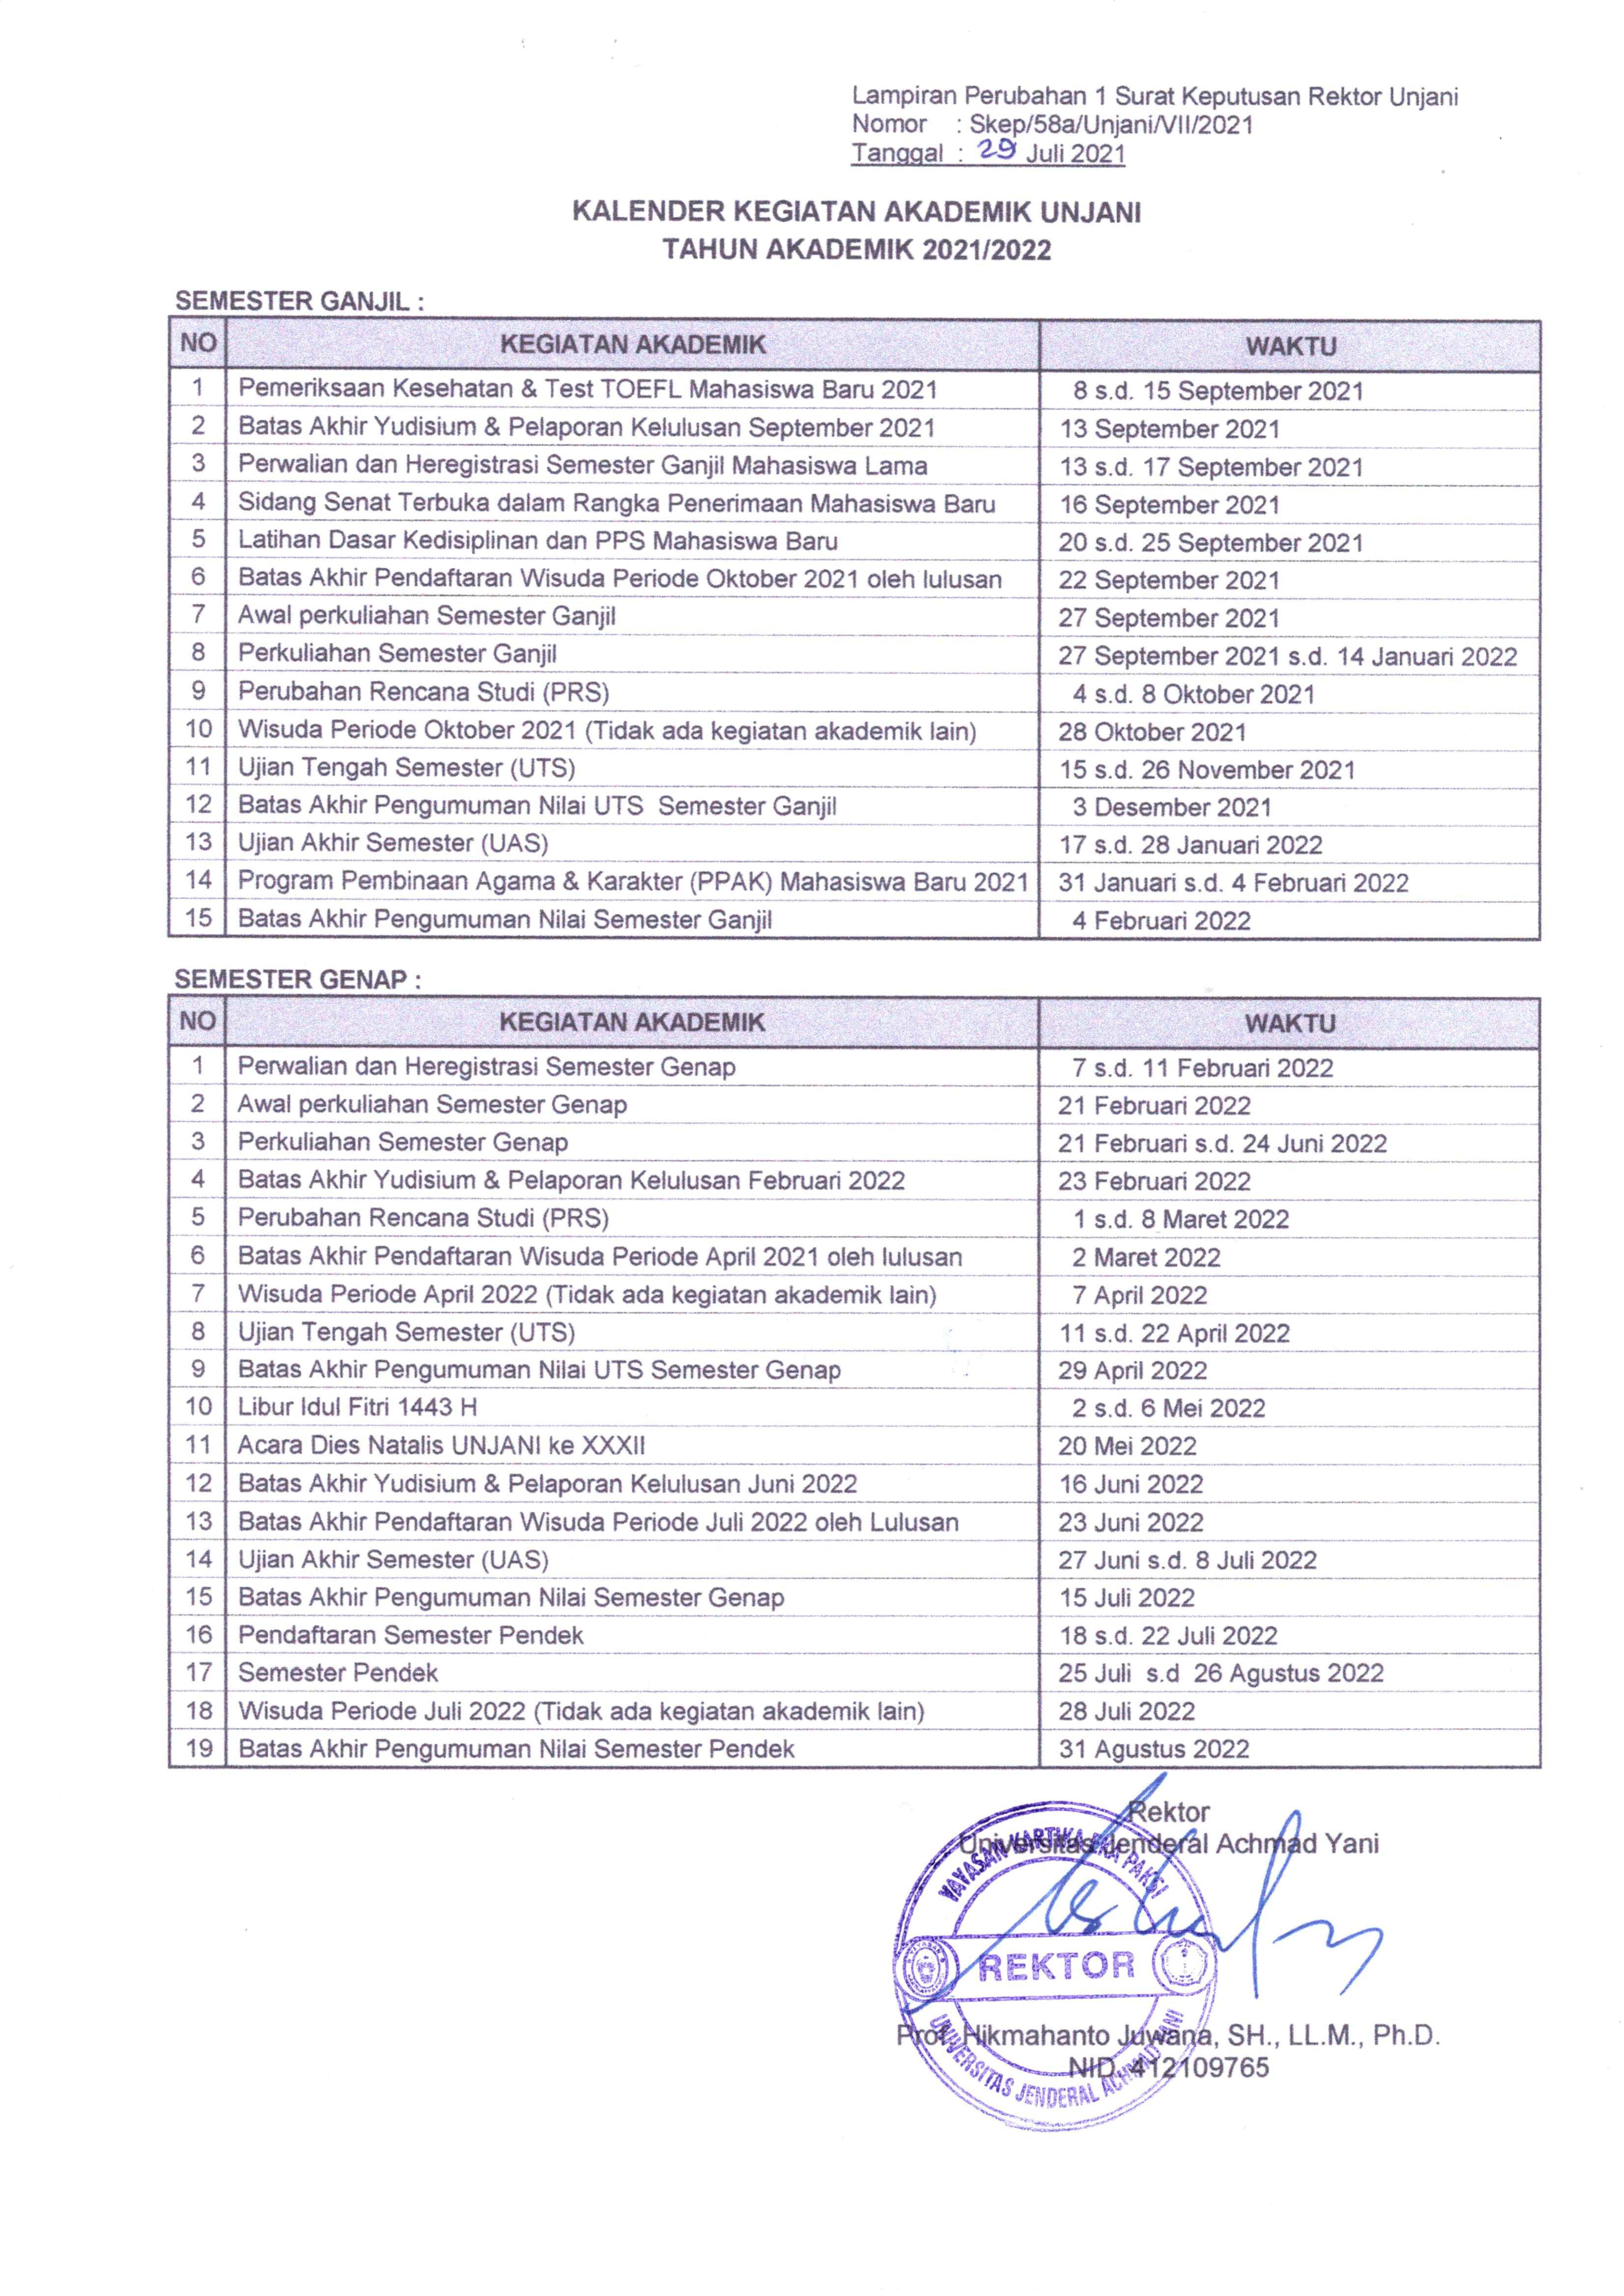 Kalender Akademik Perubahan 1_002